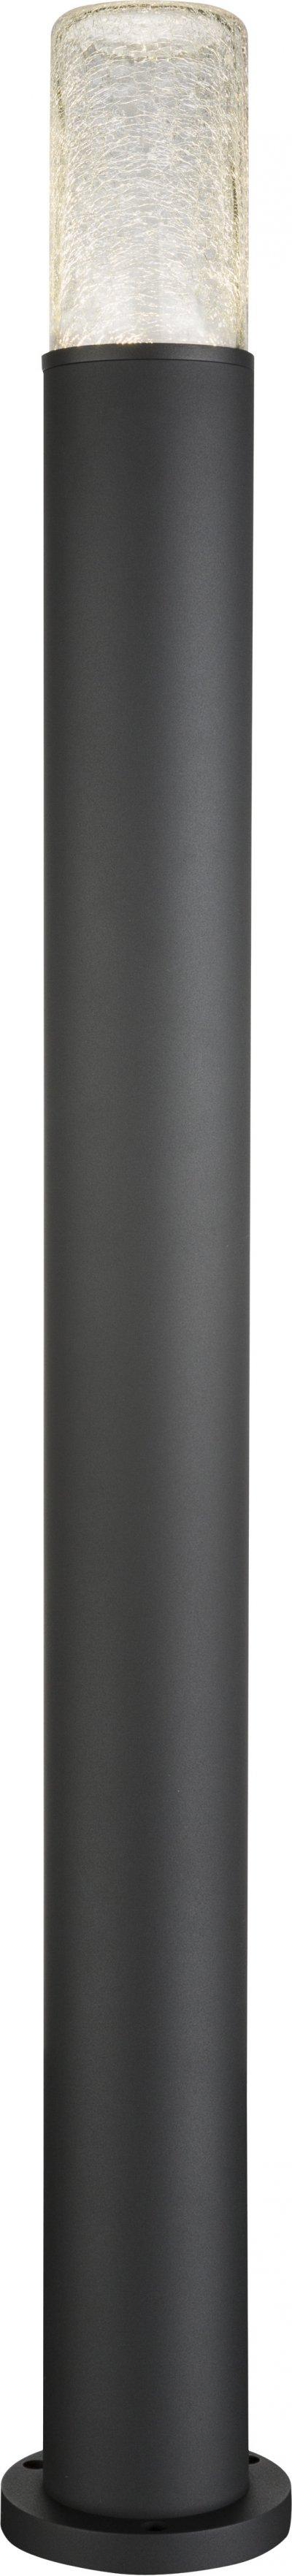 Светильник уличный Globo 32409S2Одиночные столбы<br><br><br>Тип цоколя: LED<br>Цвет арматуры: черный<br>Диаметр, мм мм: 125<br>Высота, мм: 1100